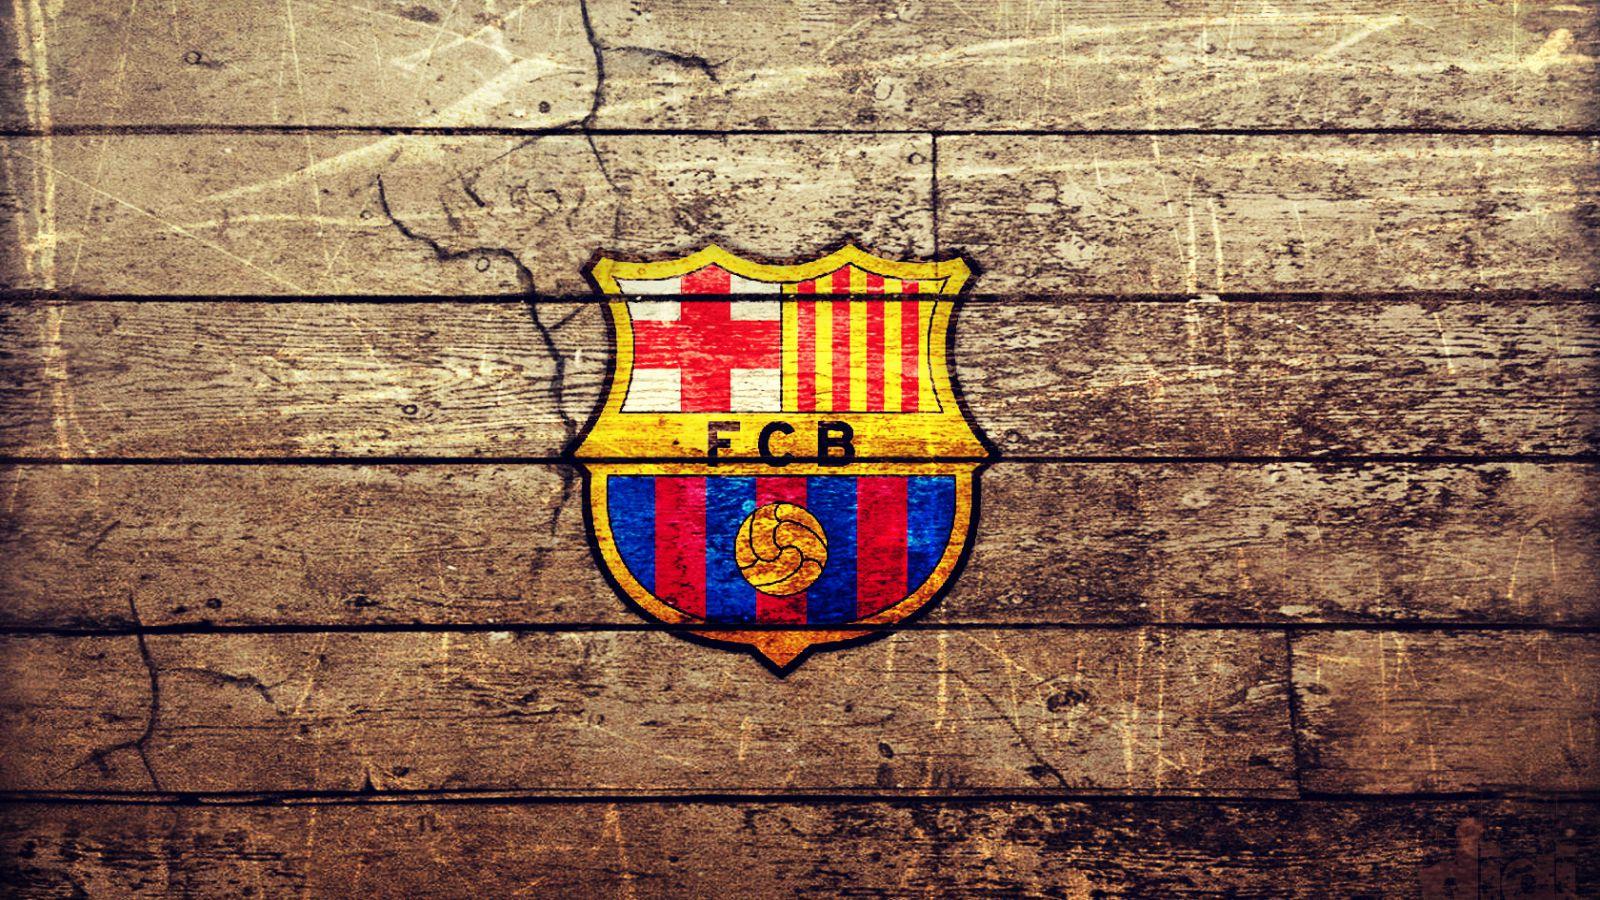 بالصور صور شعار برشلونة , اجمل صور لشعار نادى برشلونه 5547 10